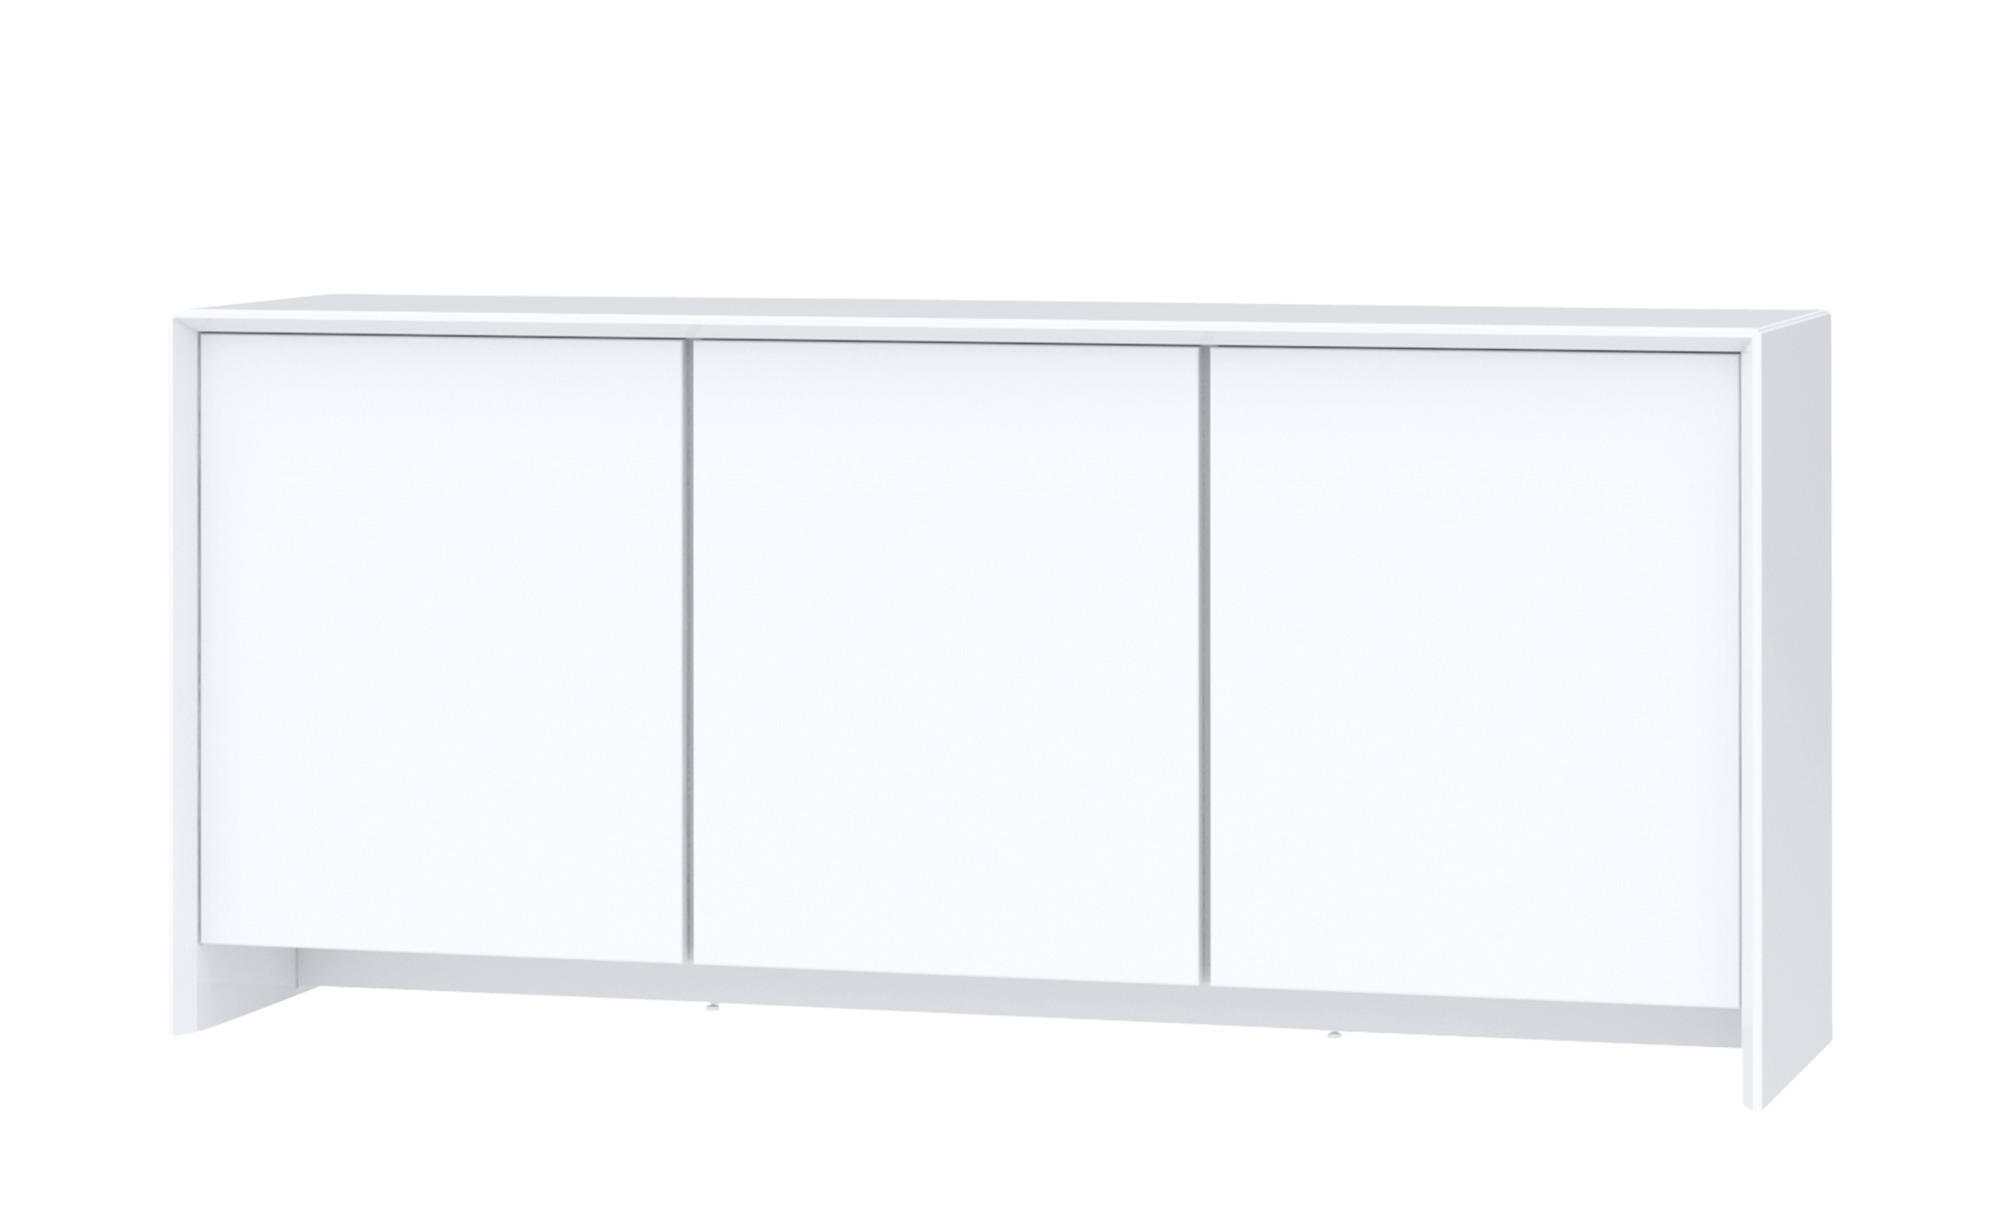 sideboard leif breite 173 cm h he 80 cm online kaufen bei woonio. Black Bedroom Furniture Sets. Home Design Ideas